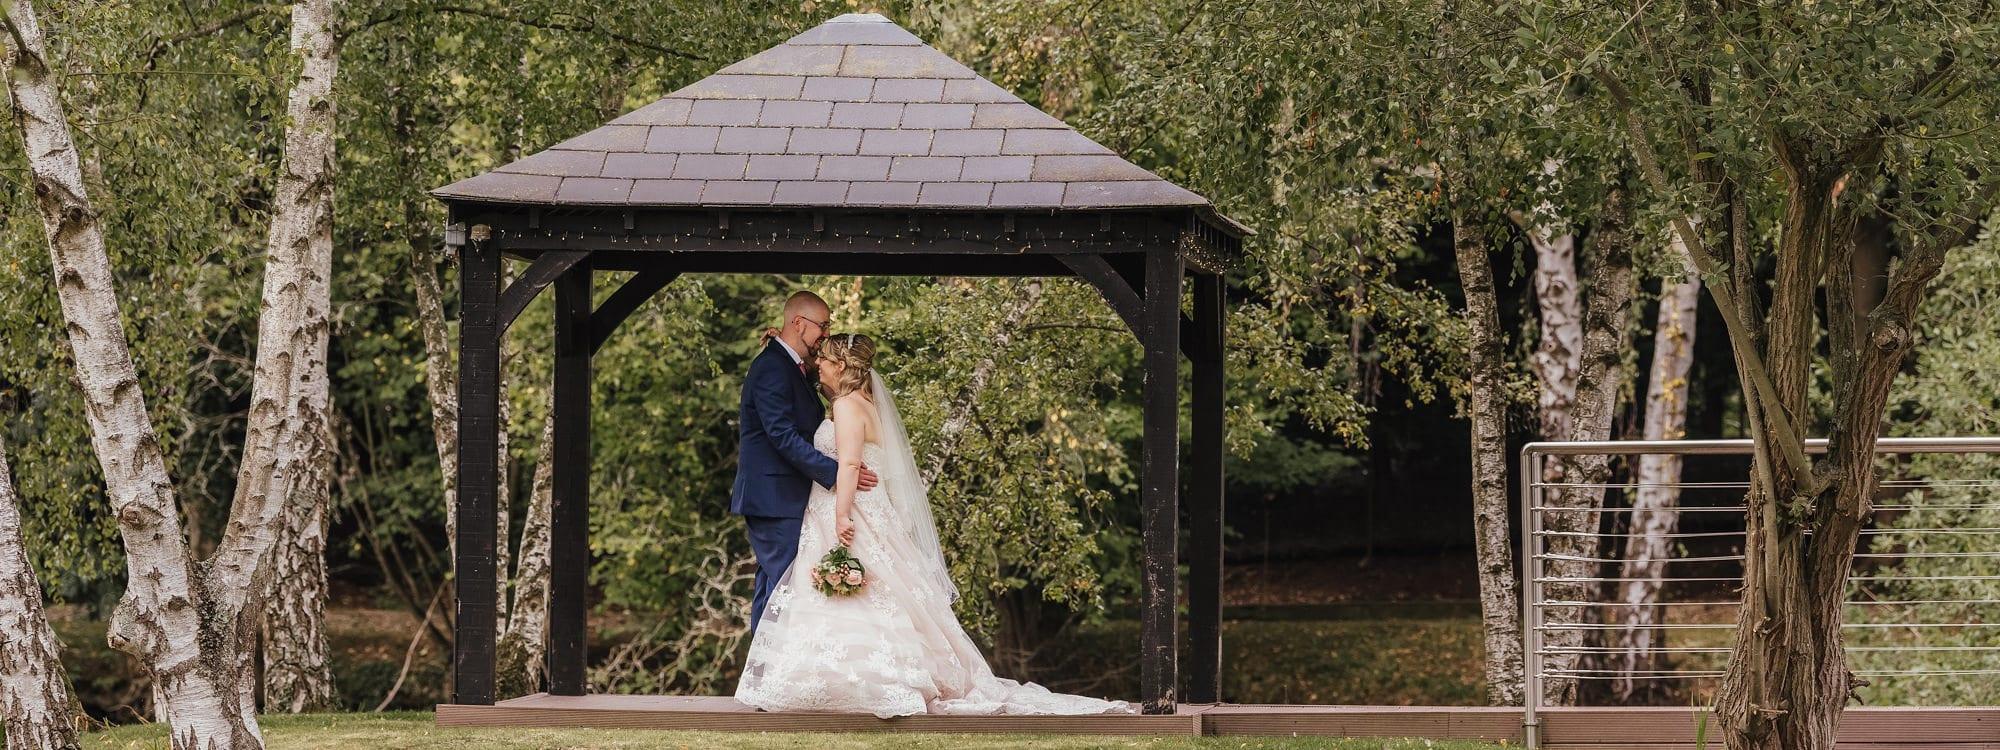 Couple Under Gazebo at Great Hallingbury Manor Essex Wedding